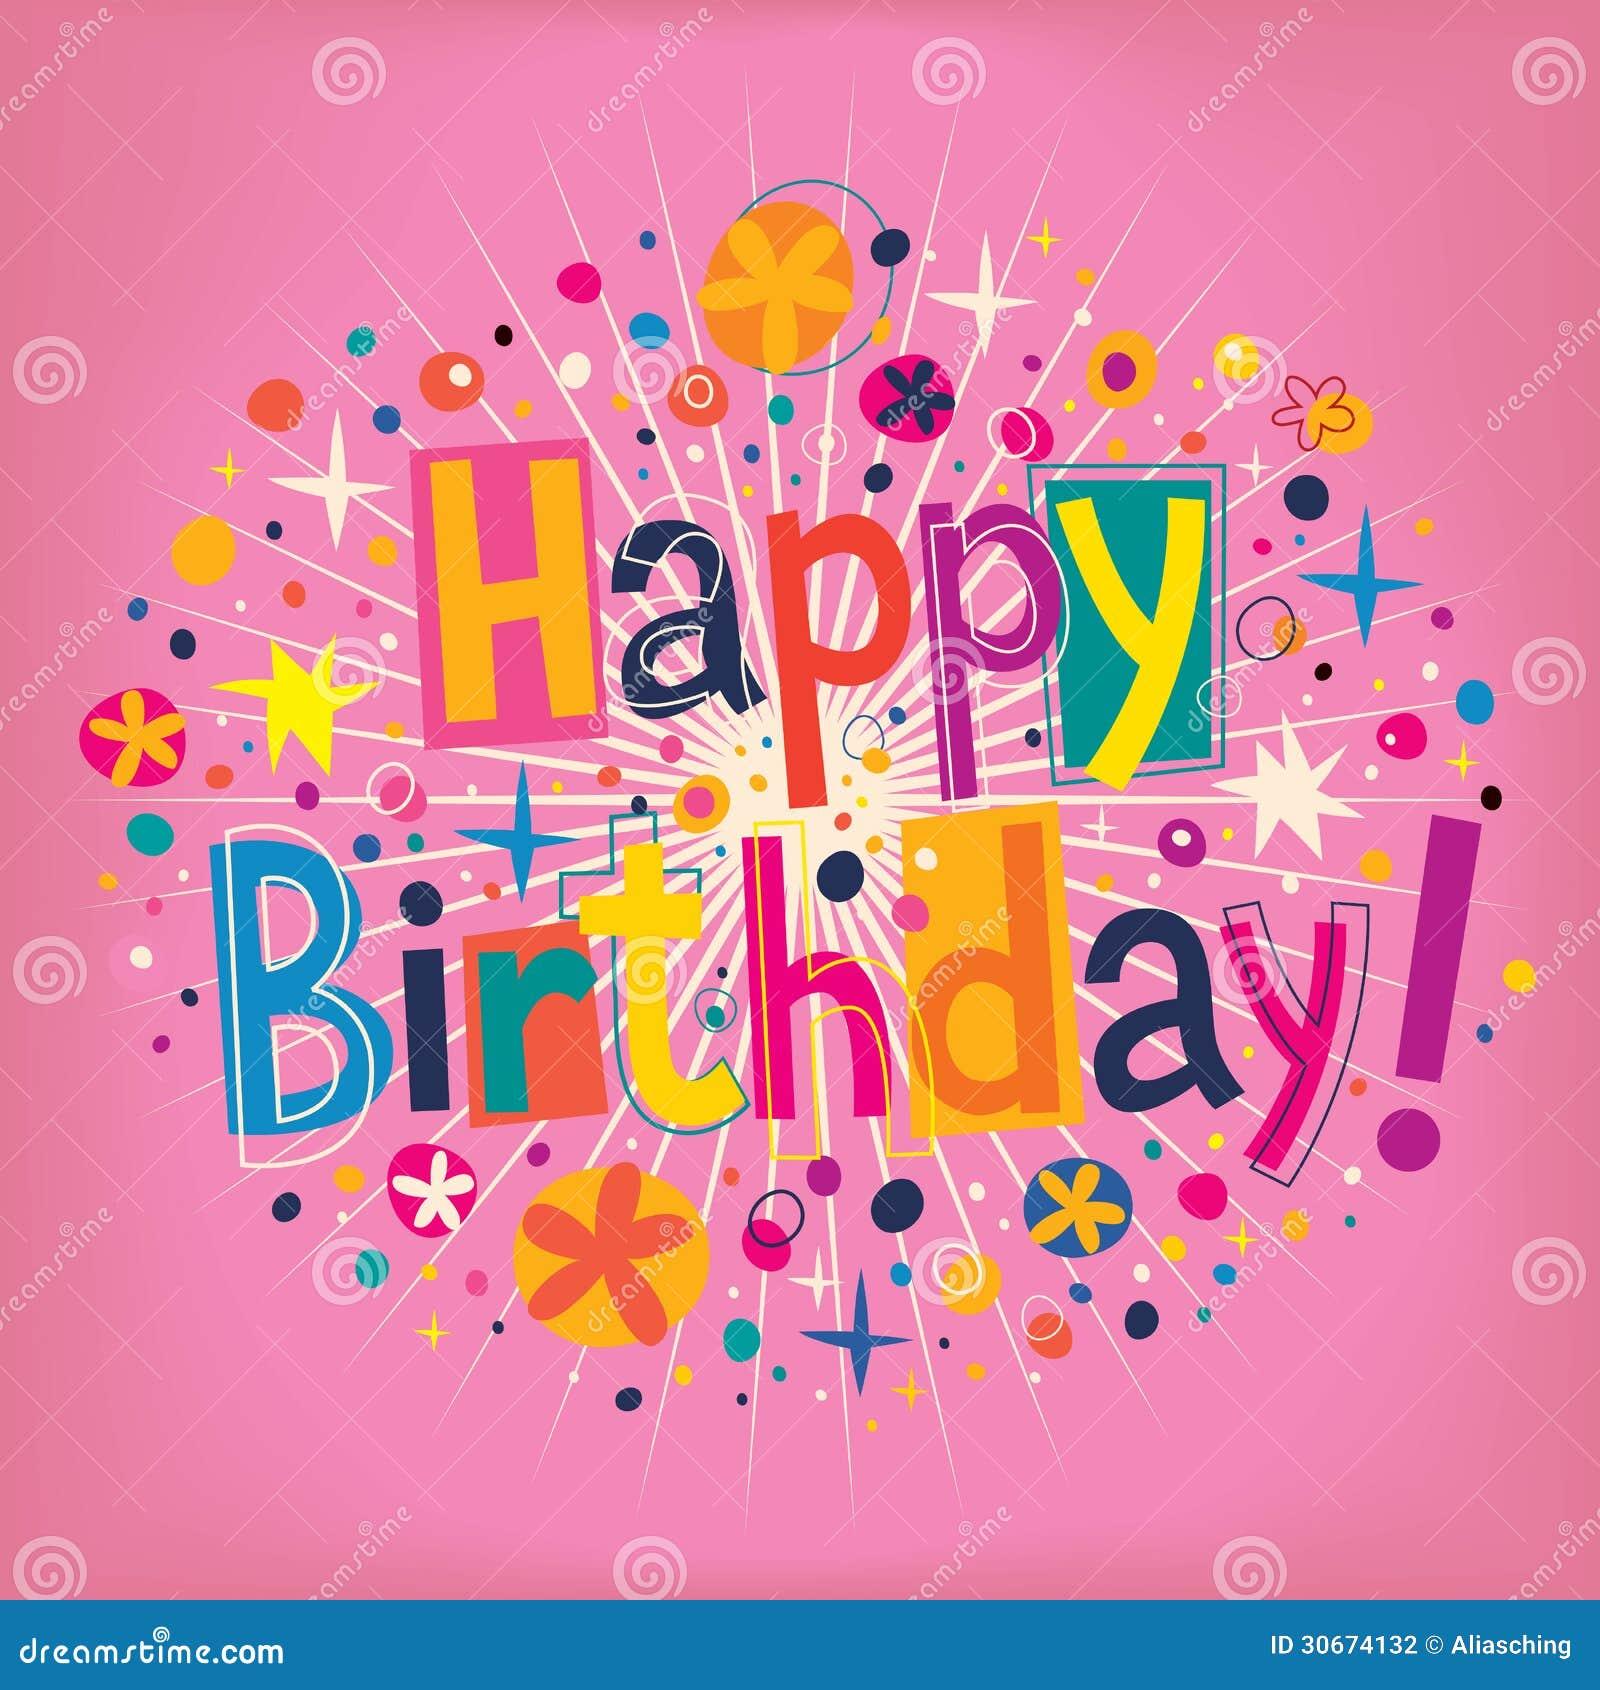 Happy birthday stock vector illustration of illustration 30674132 royalty free stock photo buycottarizona